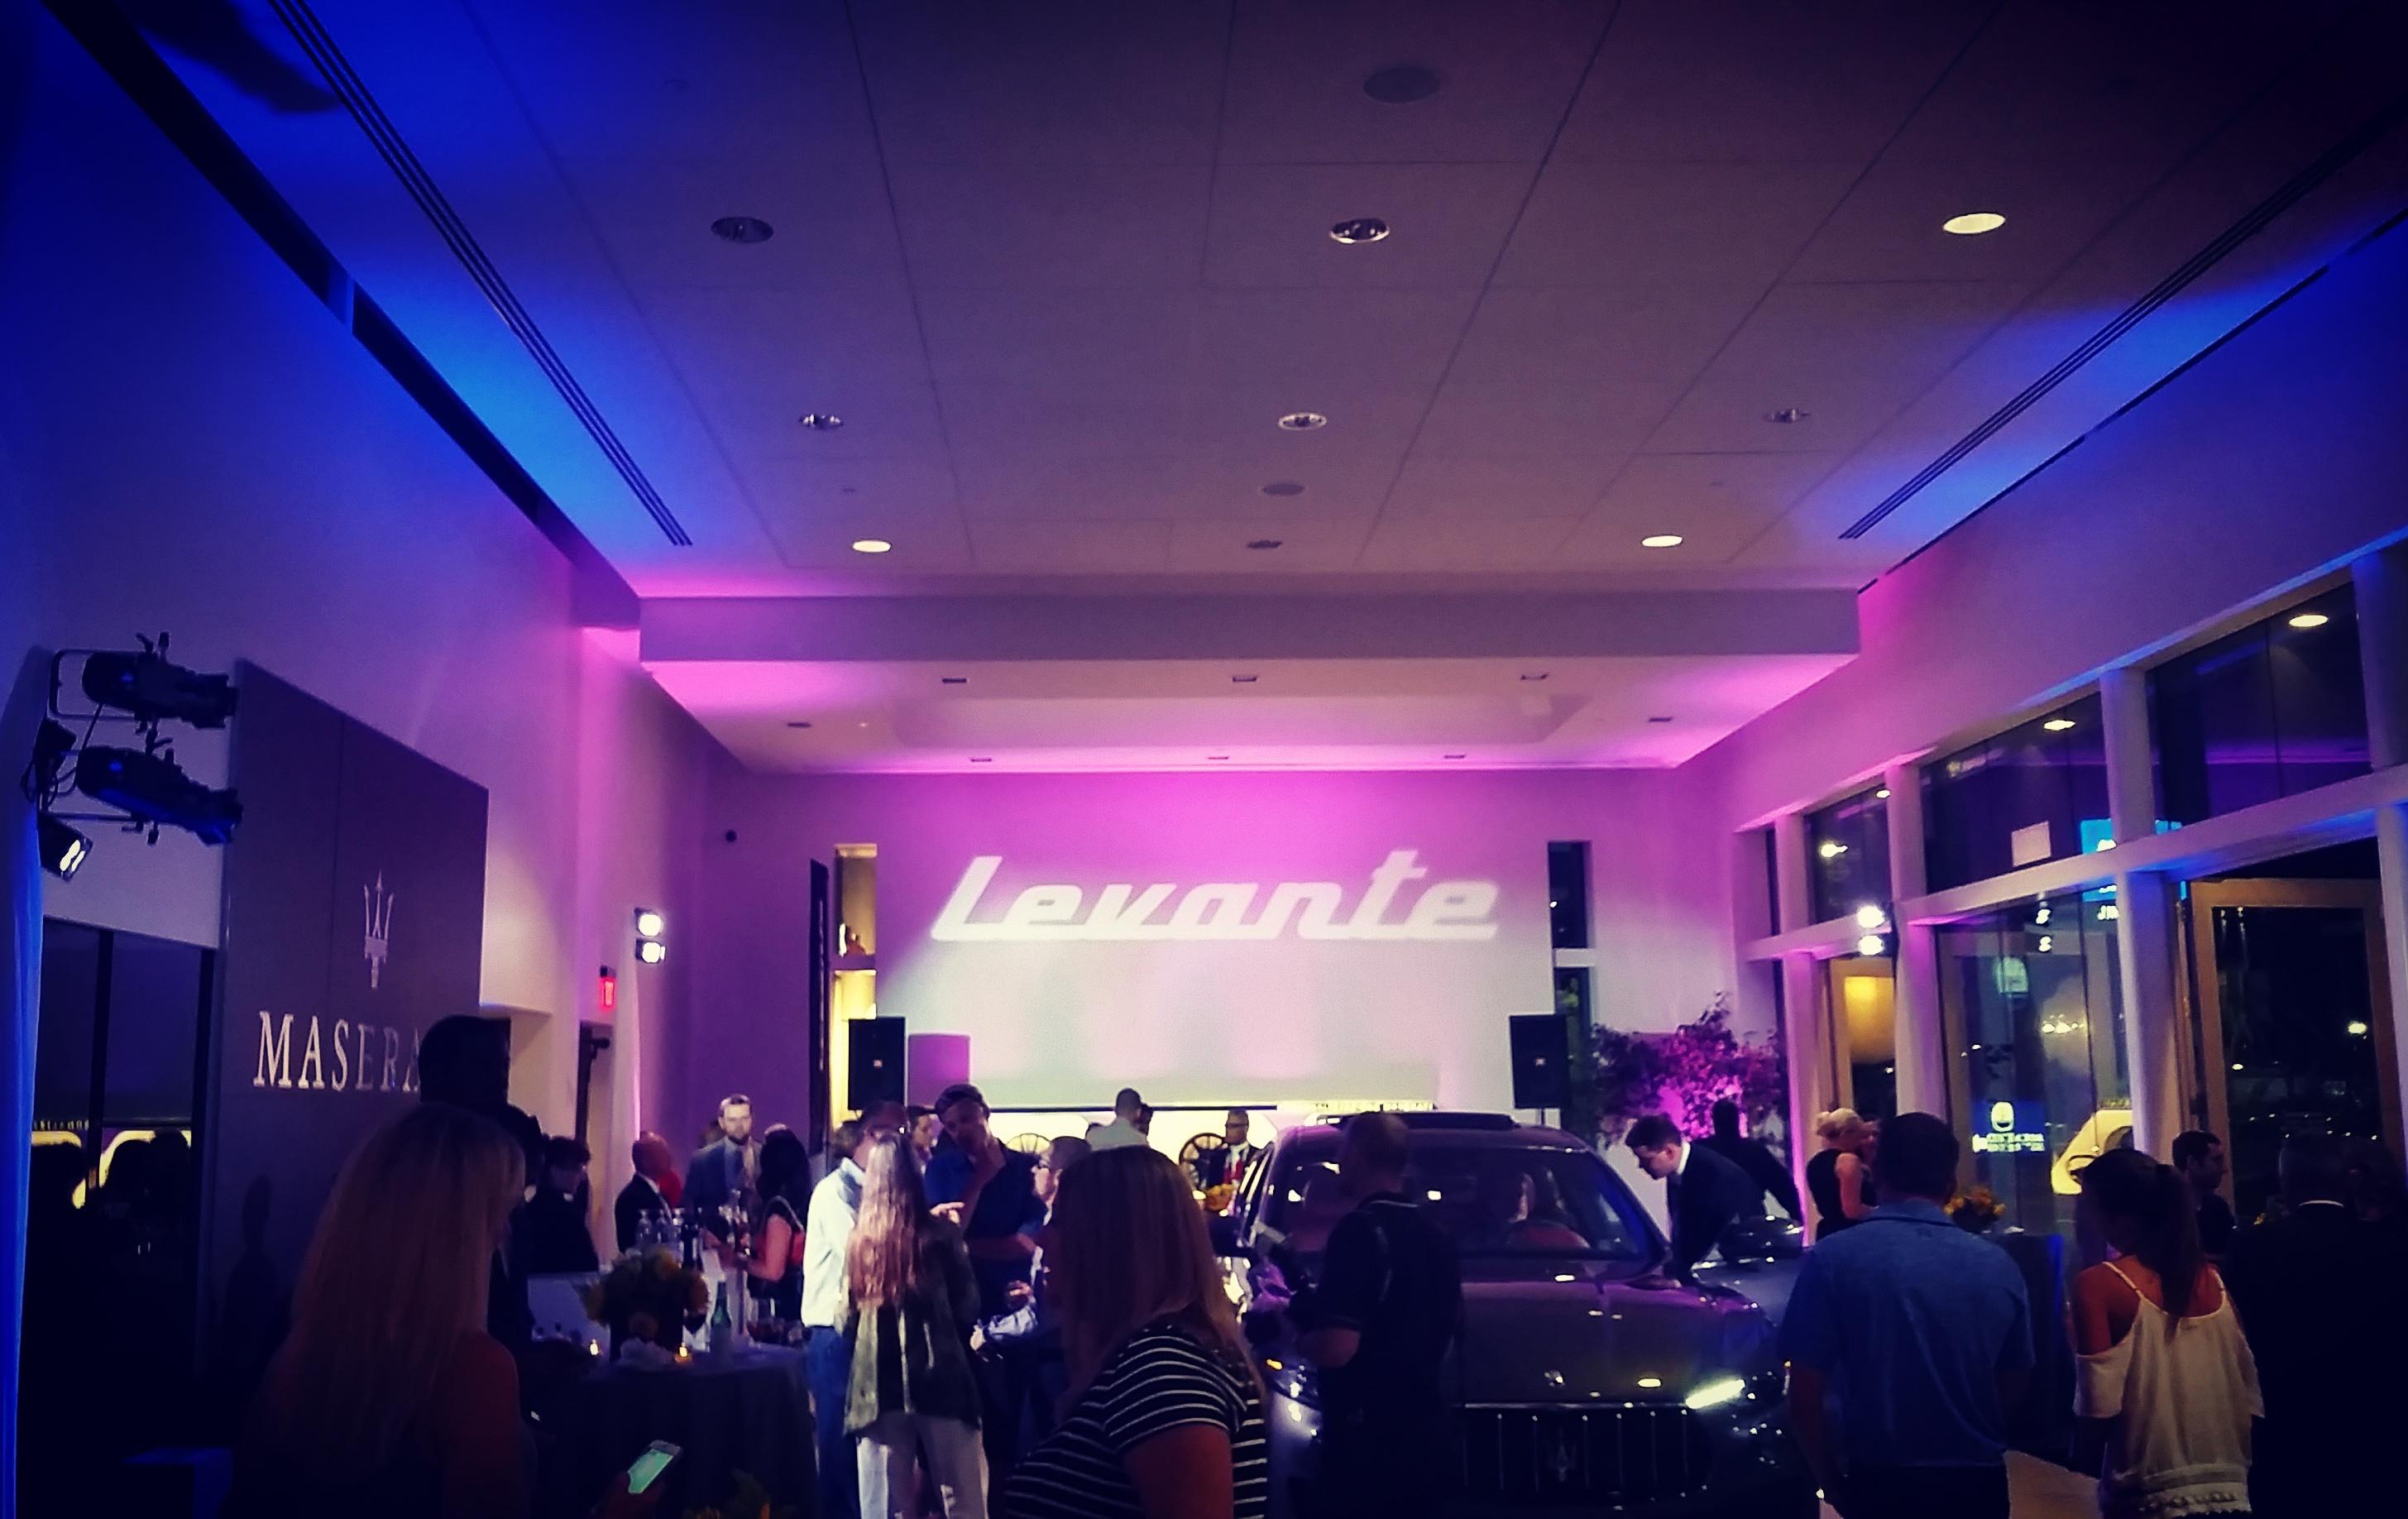 Reeves Maserati-Levante Reveal 2016